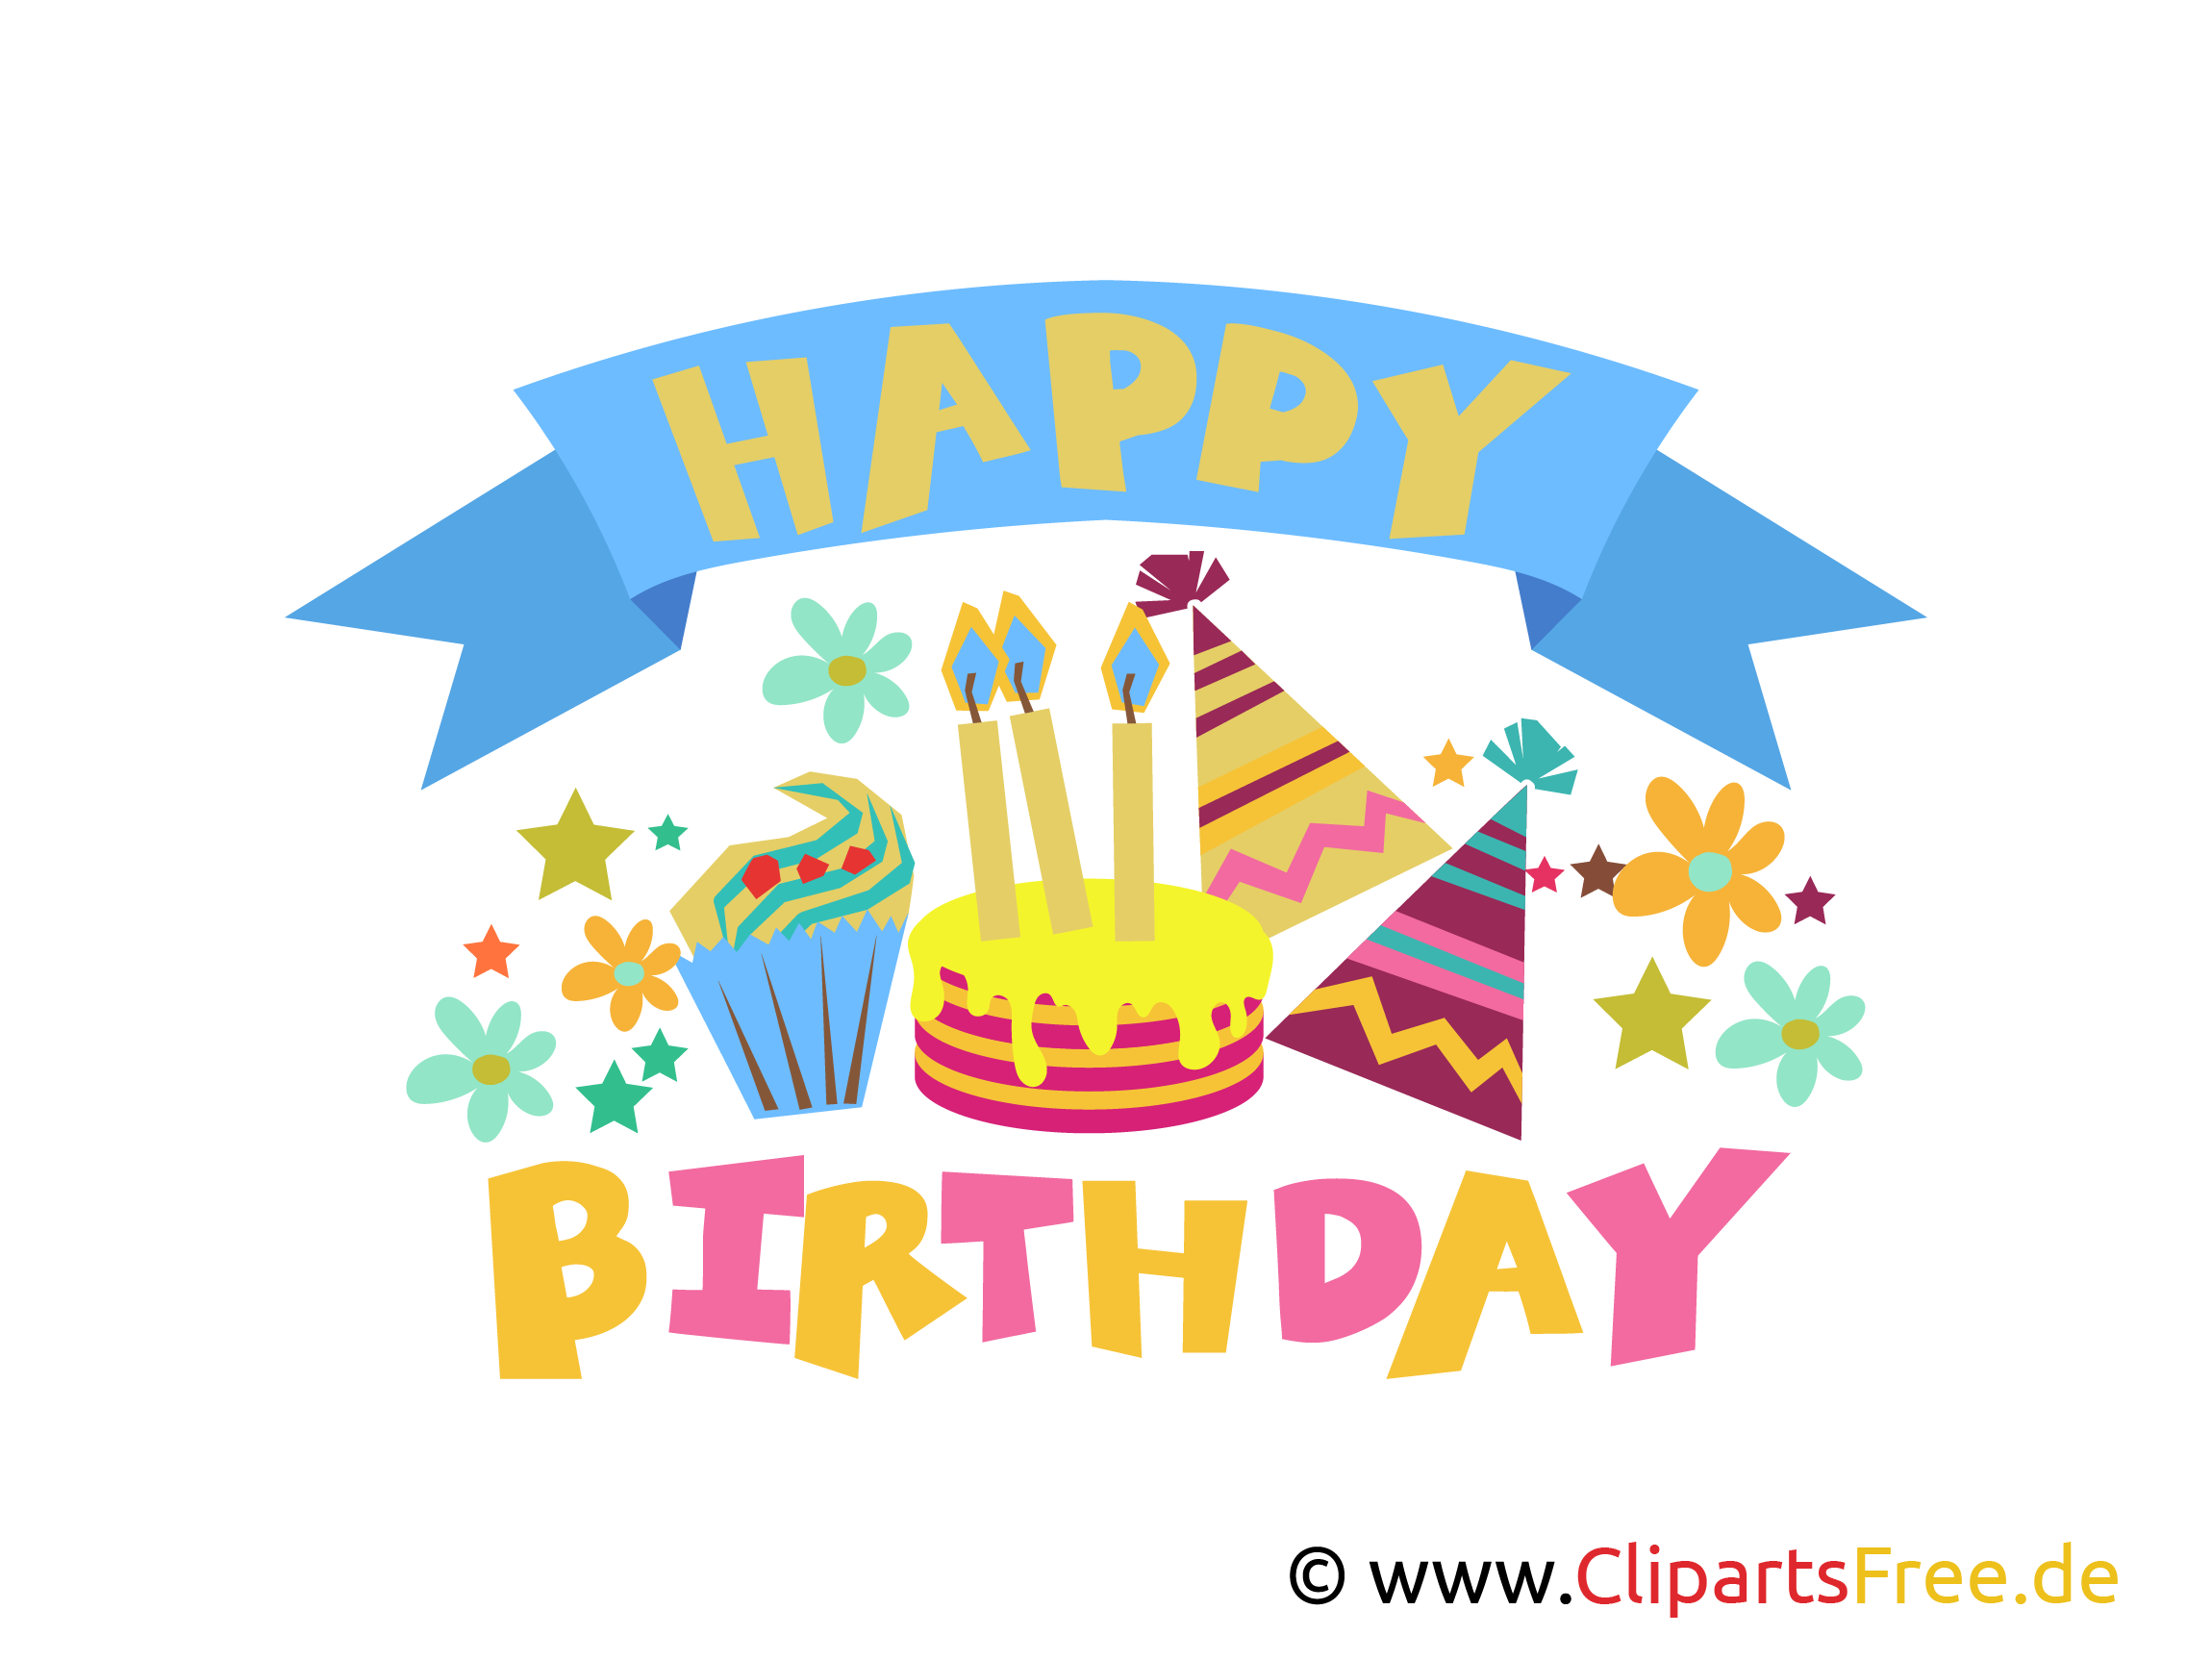 Happy Clipart, Grafik, E-Karte, Bild kostenlos herunterladen